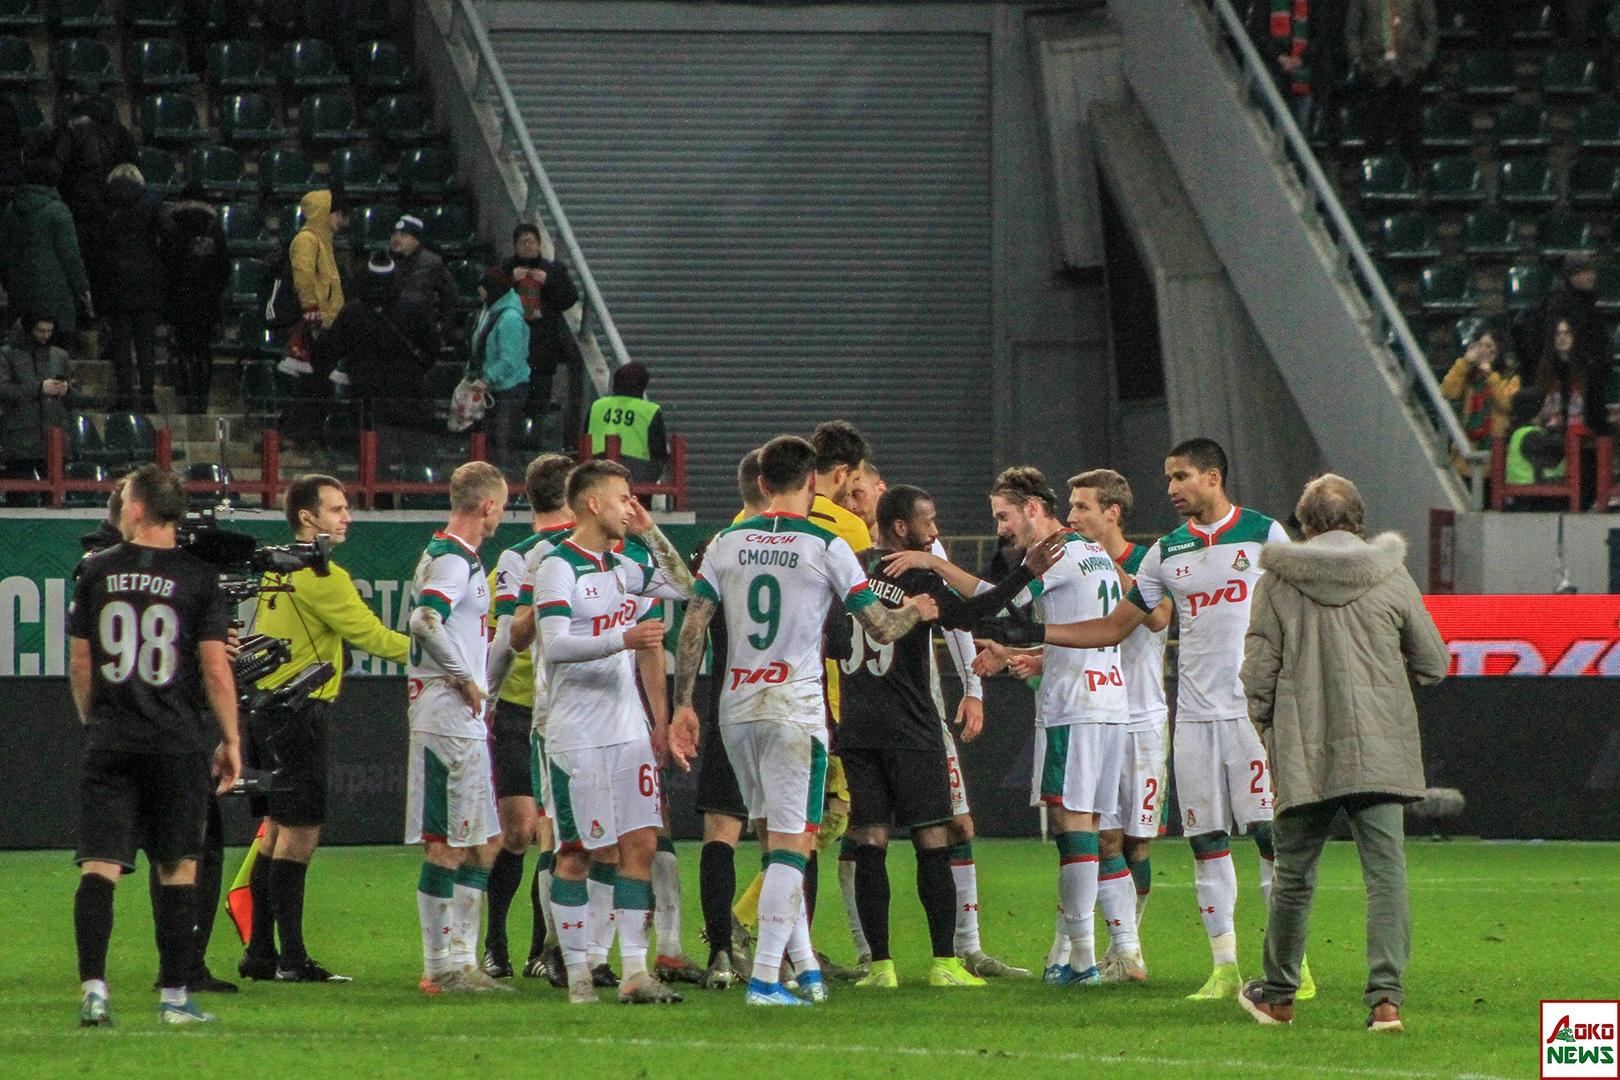 Локомотив - Краснодар. Фото: Дмитрий Бурдонов / Loko.News